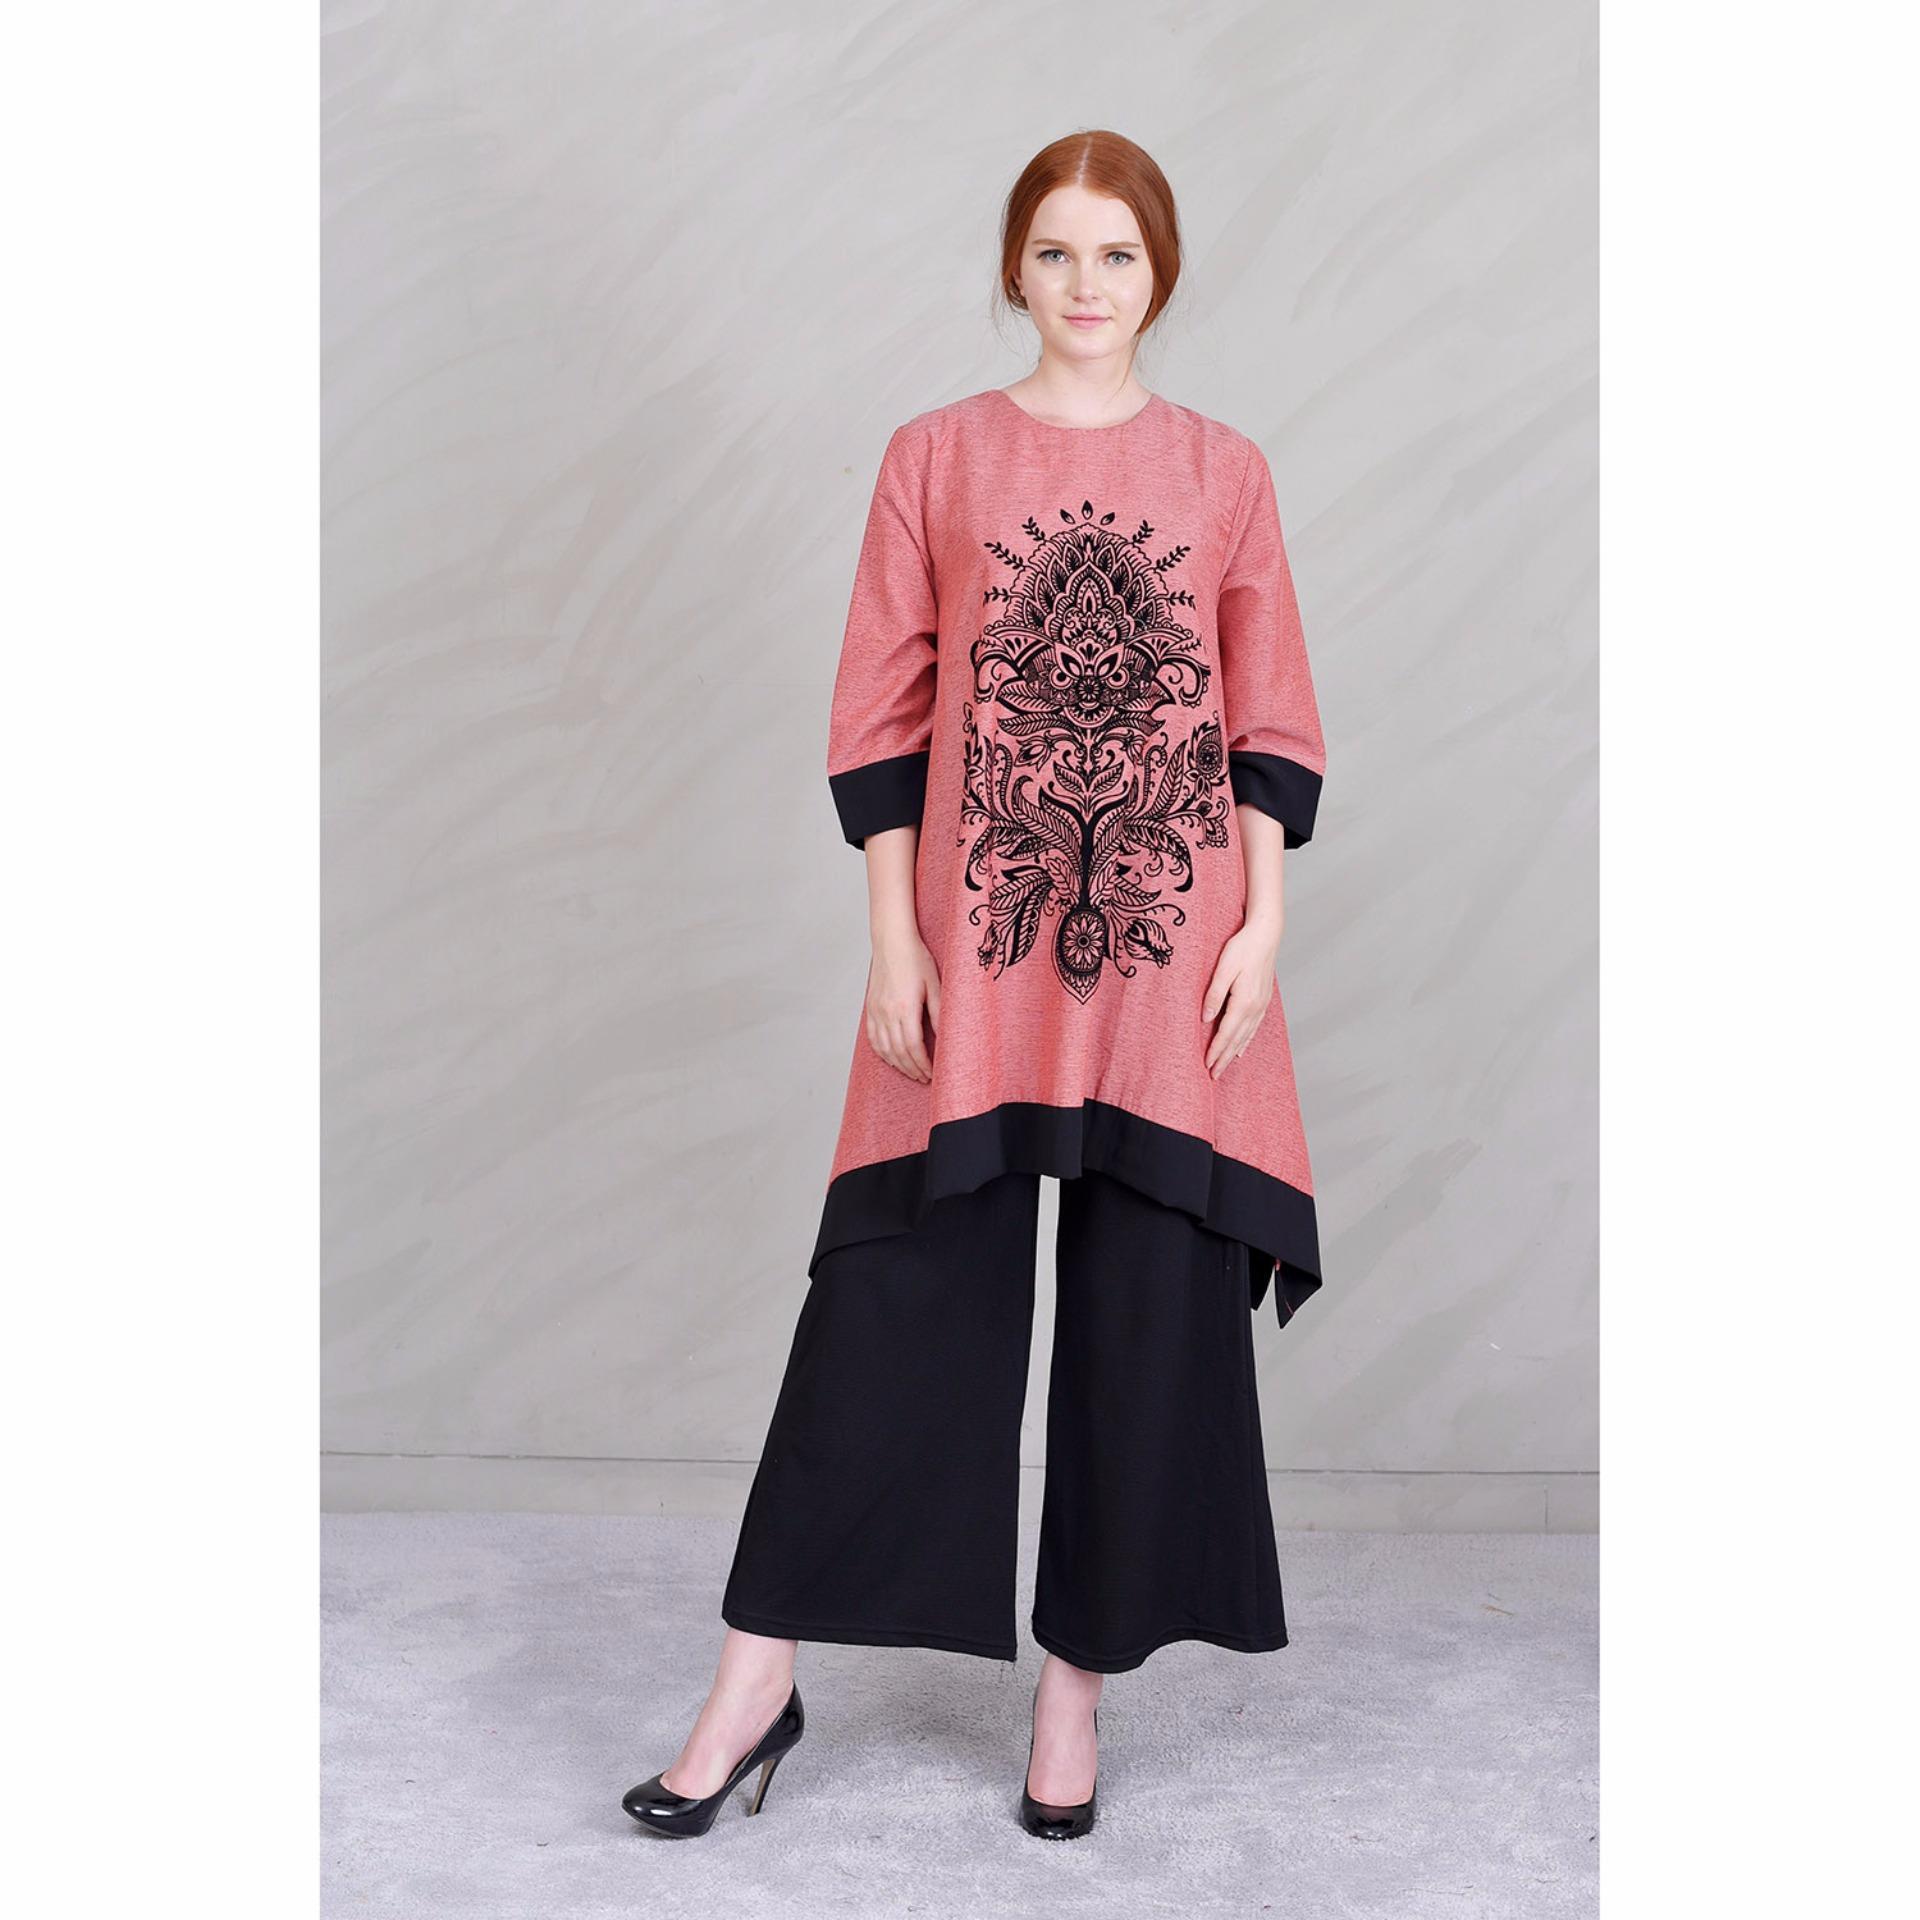 Jfashion New Wide Long Tunik Print Beludru 34 Sleeve Arimbi Pink Lakesha Dusty 3 4